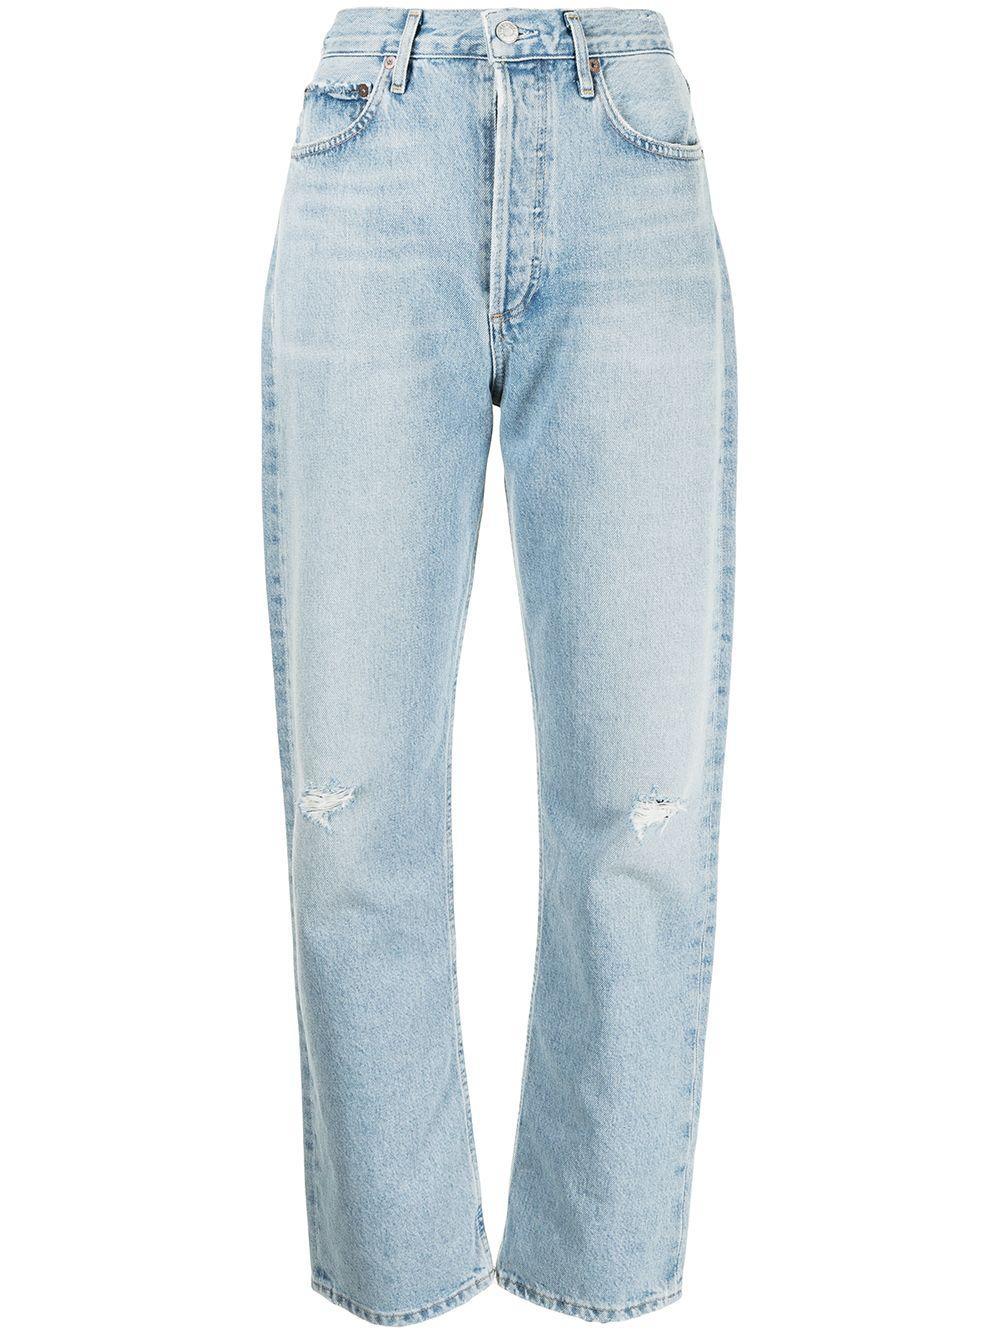 90s Pinchwaist High Rise Jeans